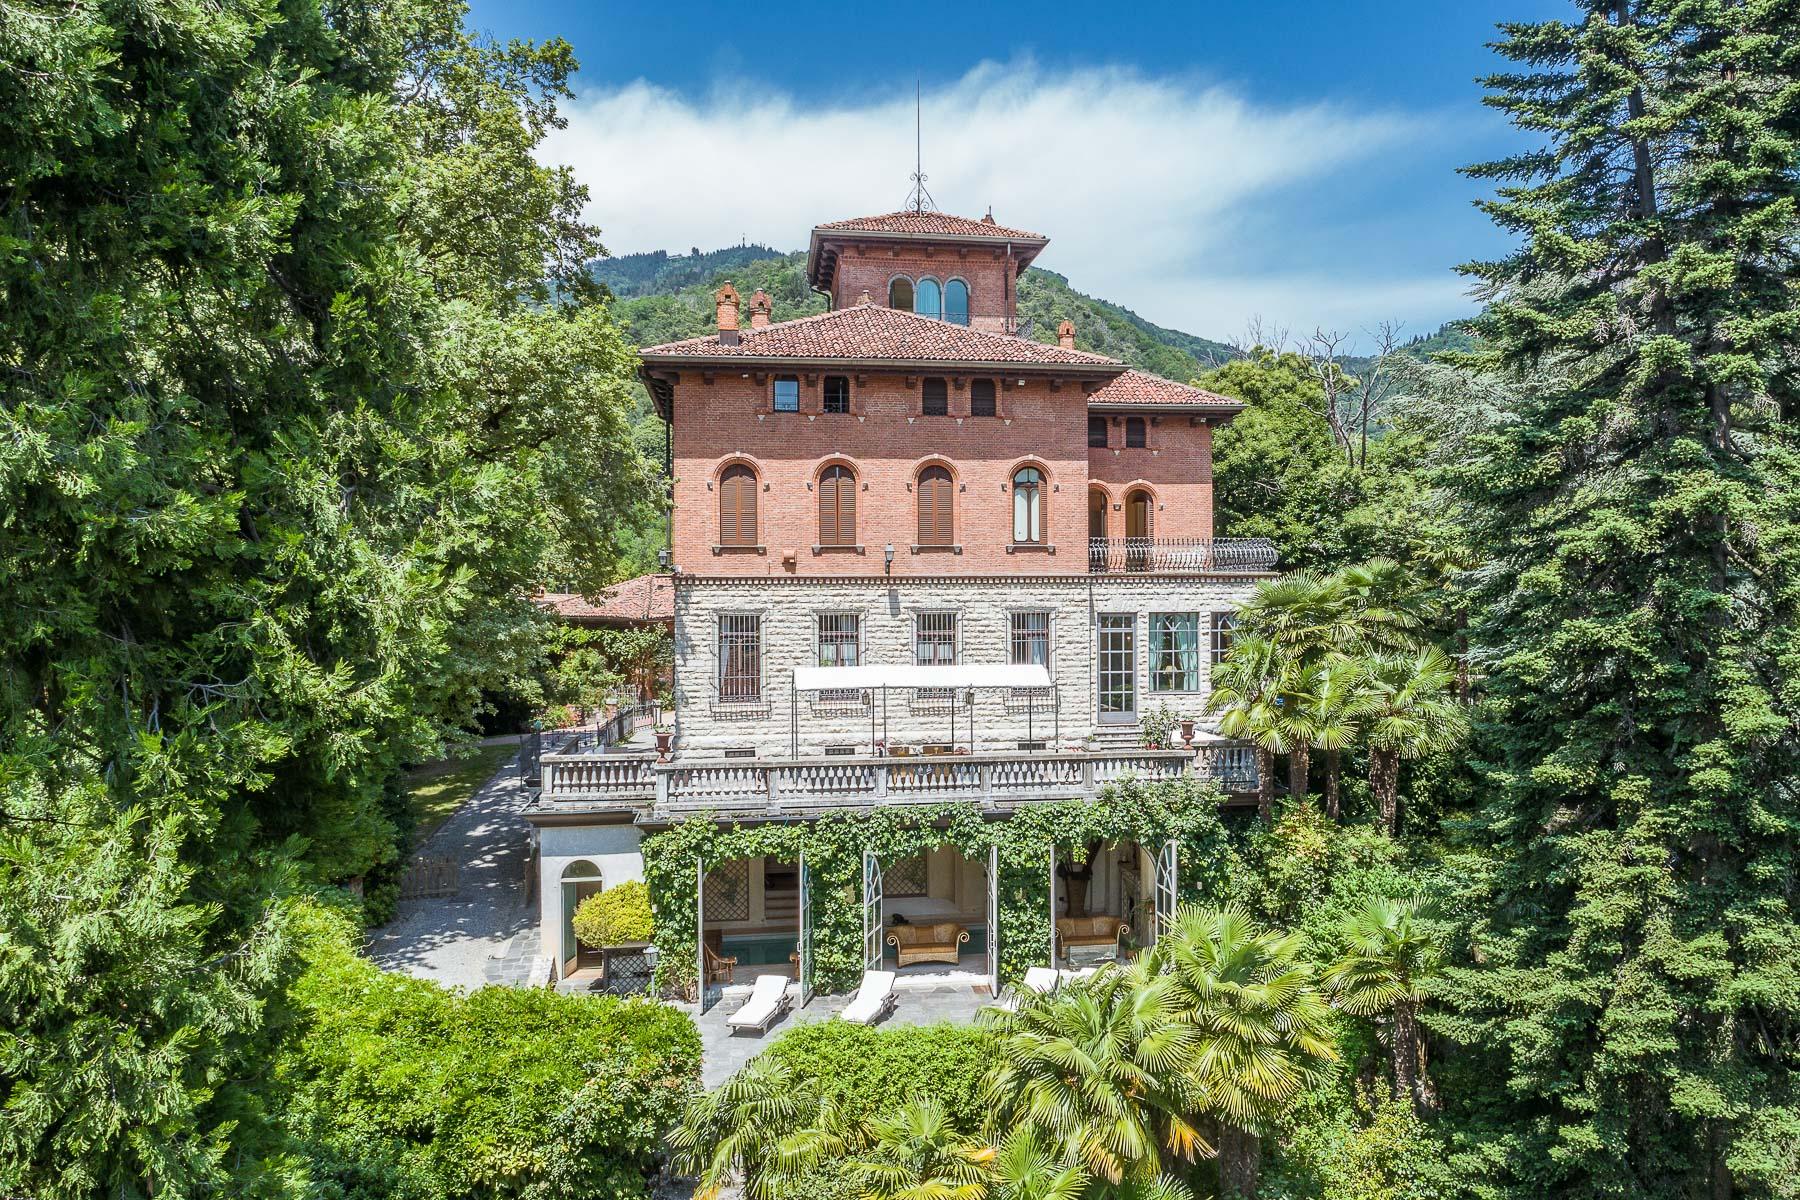 Villa in Vendita a Varese: 5 locali, 1150 mq - Foto 23